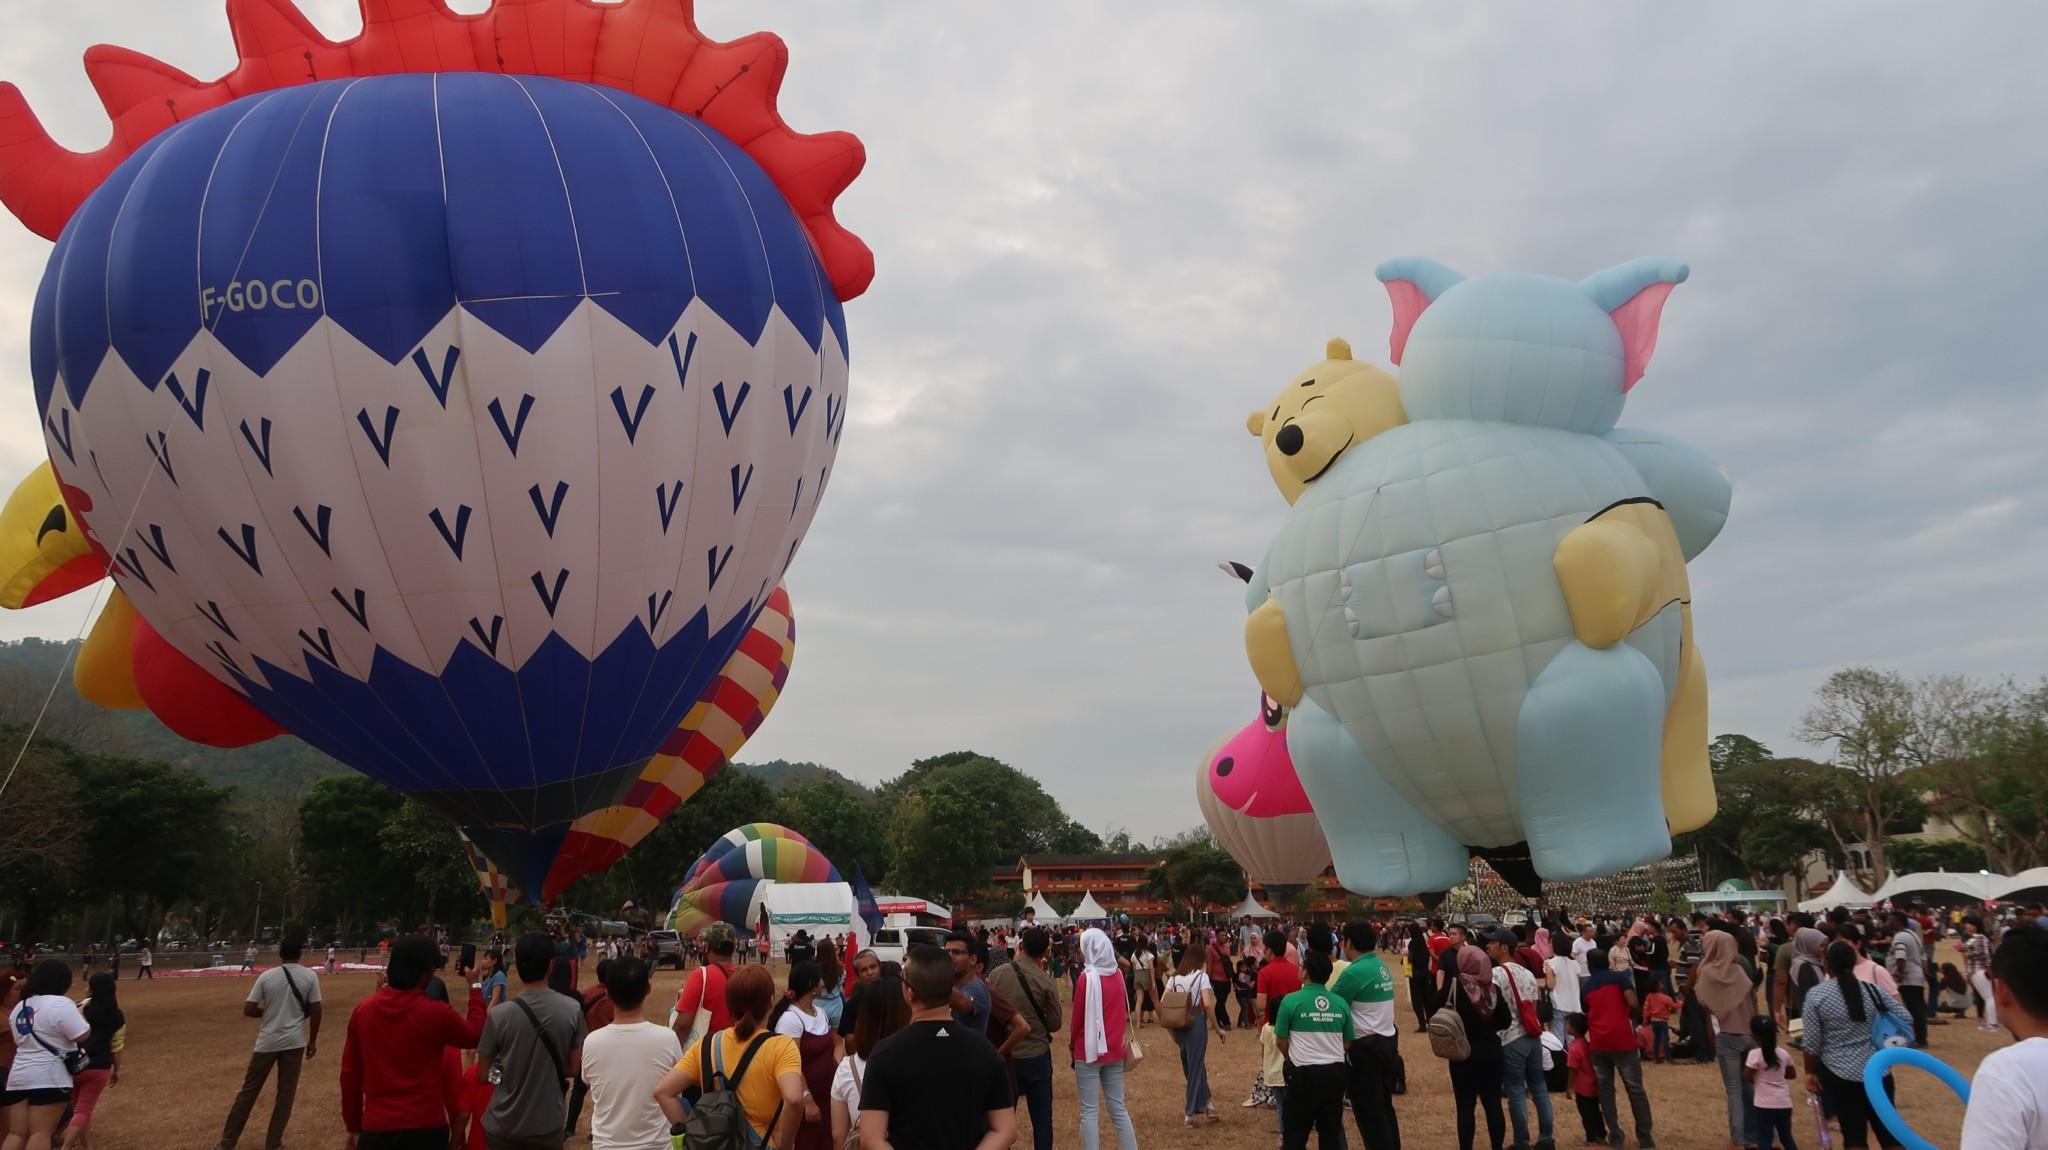 Ballons in Penang